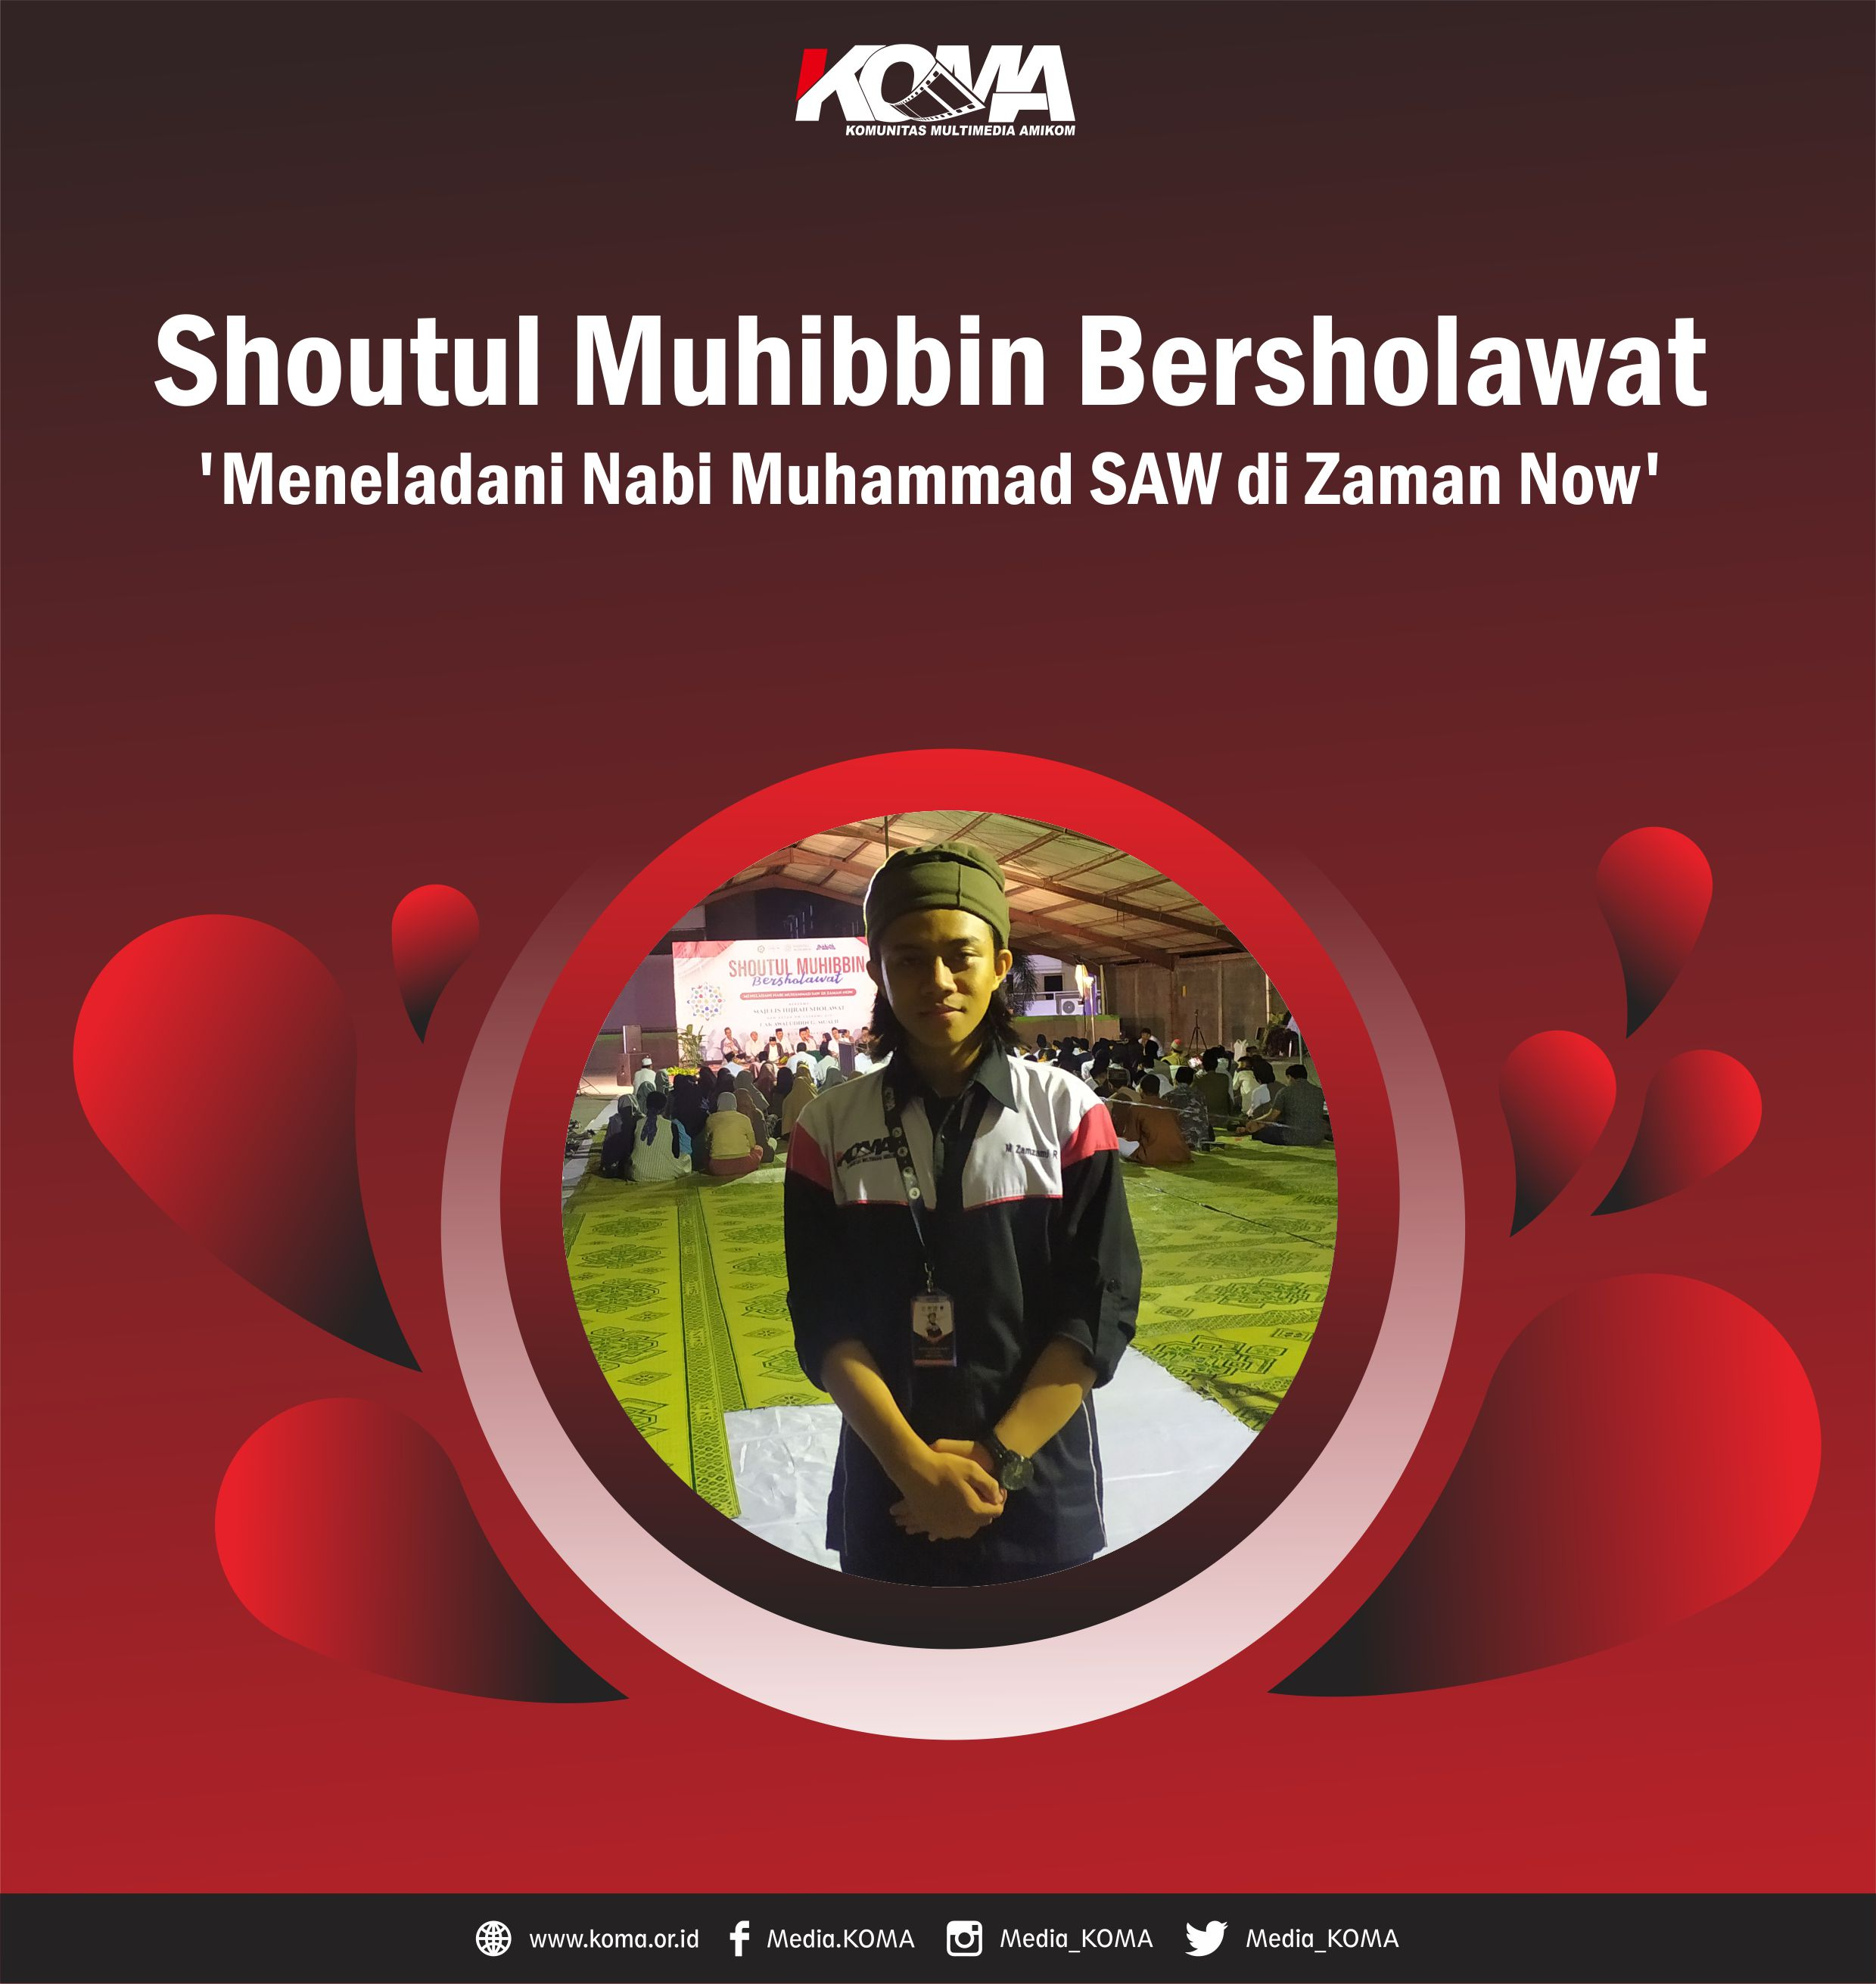 Shoutul-Muhibbin-Bersholawat-Meneladani-Nabi-Muhammas-SAW-di-Zaman-Now